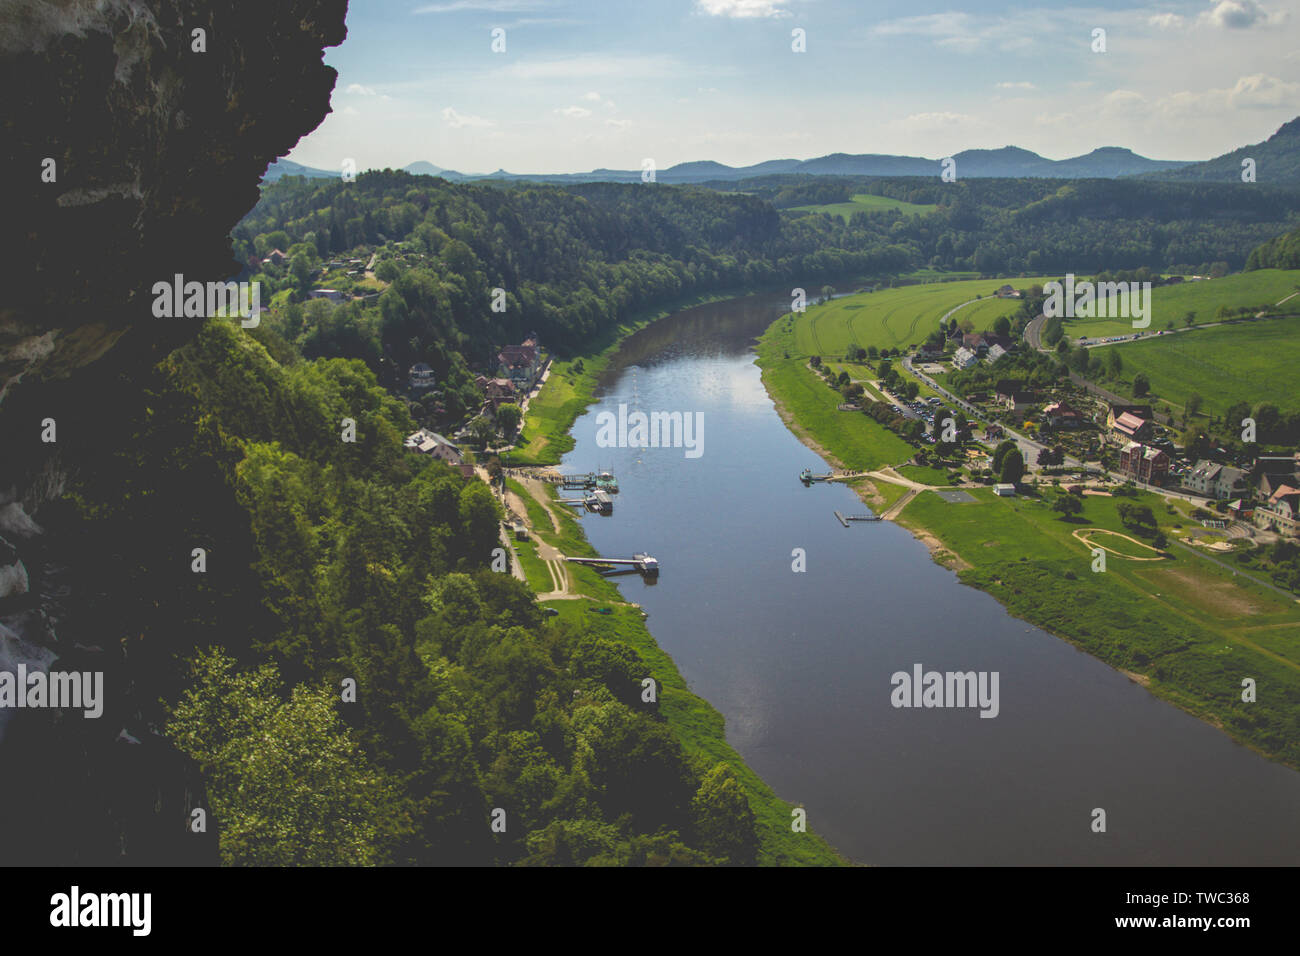 Beautiful view over the Elbsandsteingebirge (Elbe Sandstone Highlands). A mountain range of sandstone in Saxony, Germany. - Stock Image